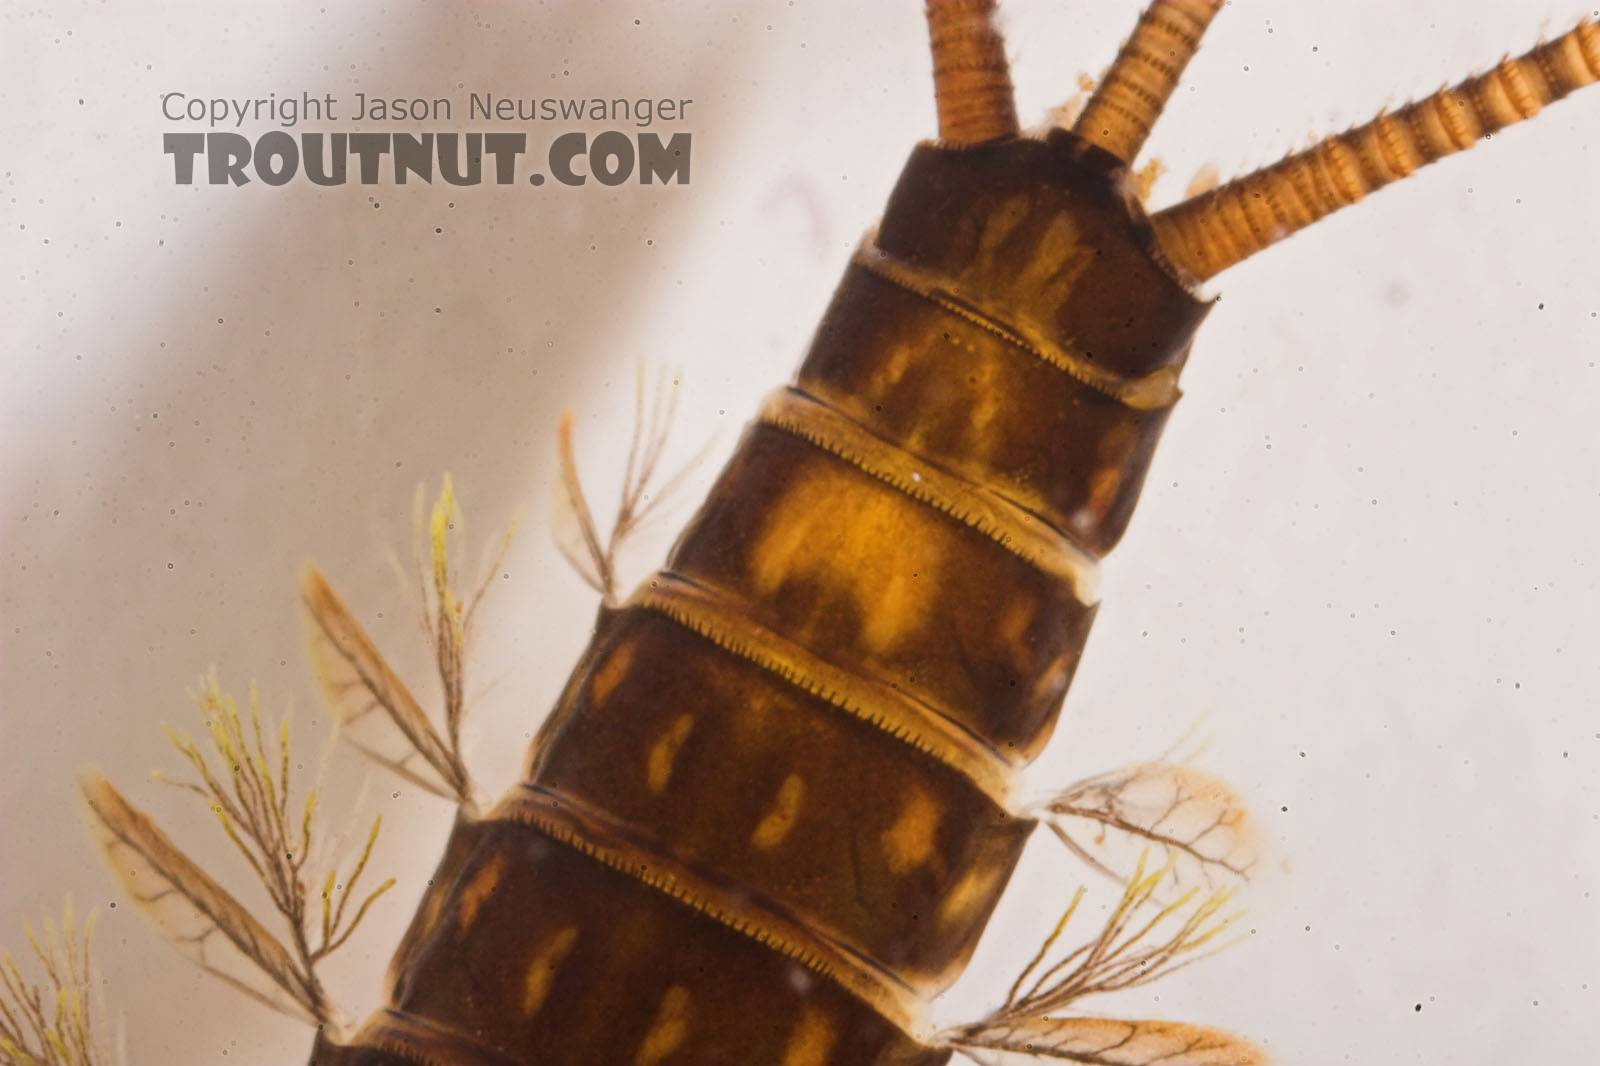 Heptagenia elegantula (Pale Evening Dun) Mayfly Nymph from Eighteenmile Creek in Wisconsin